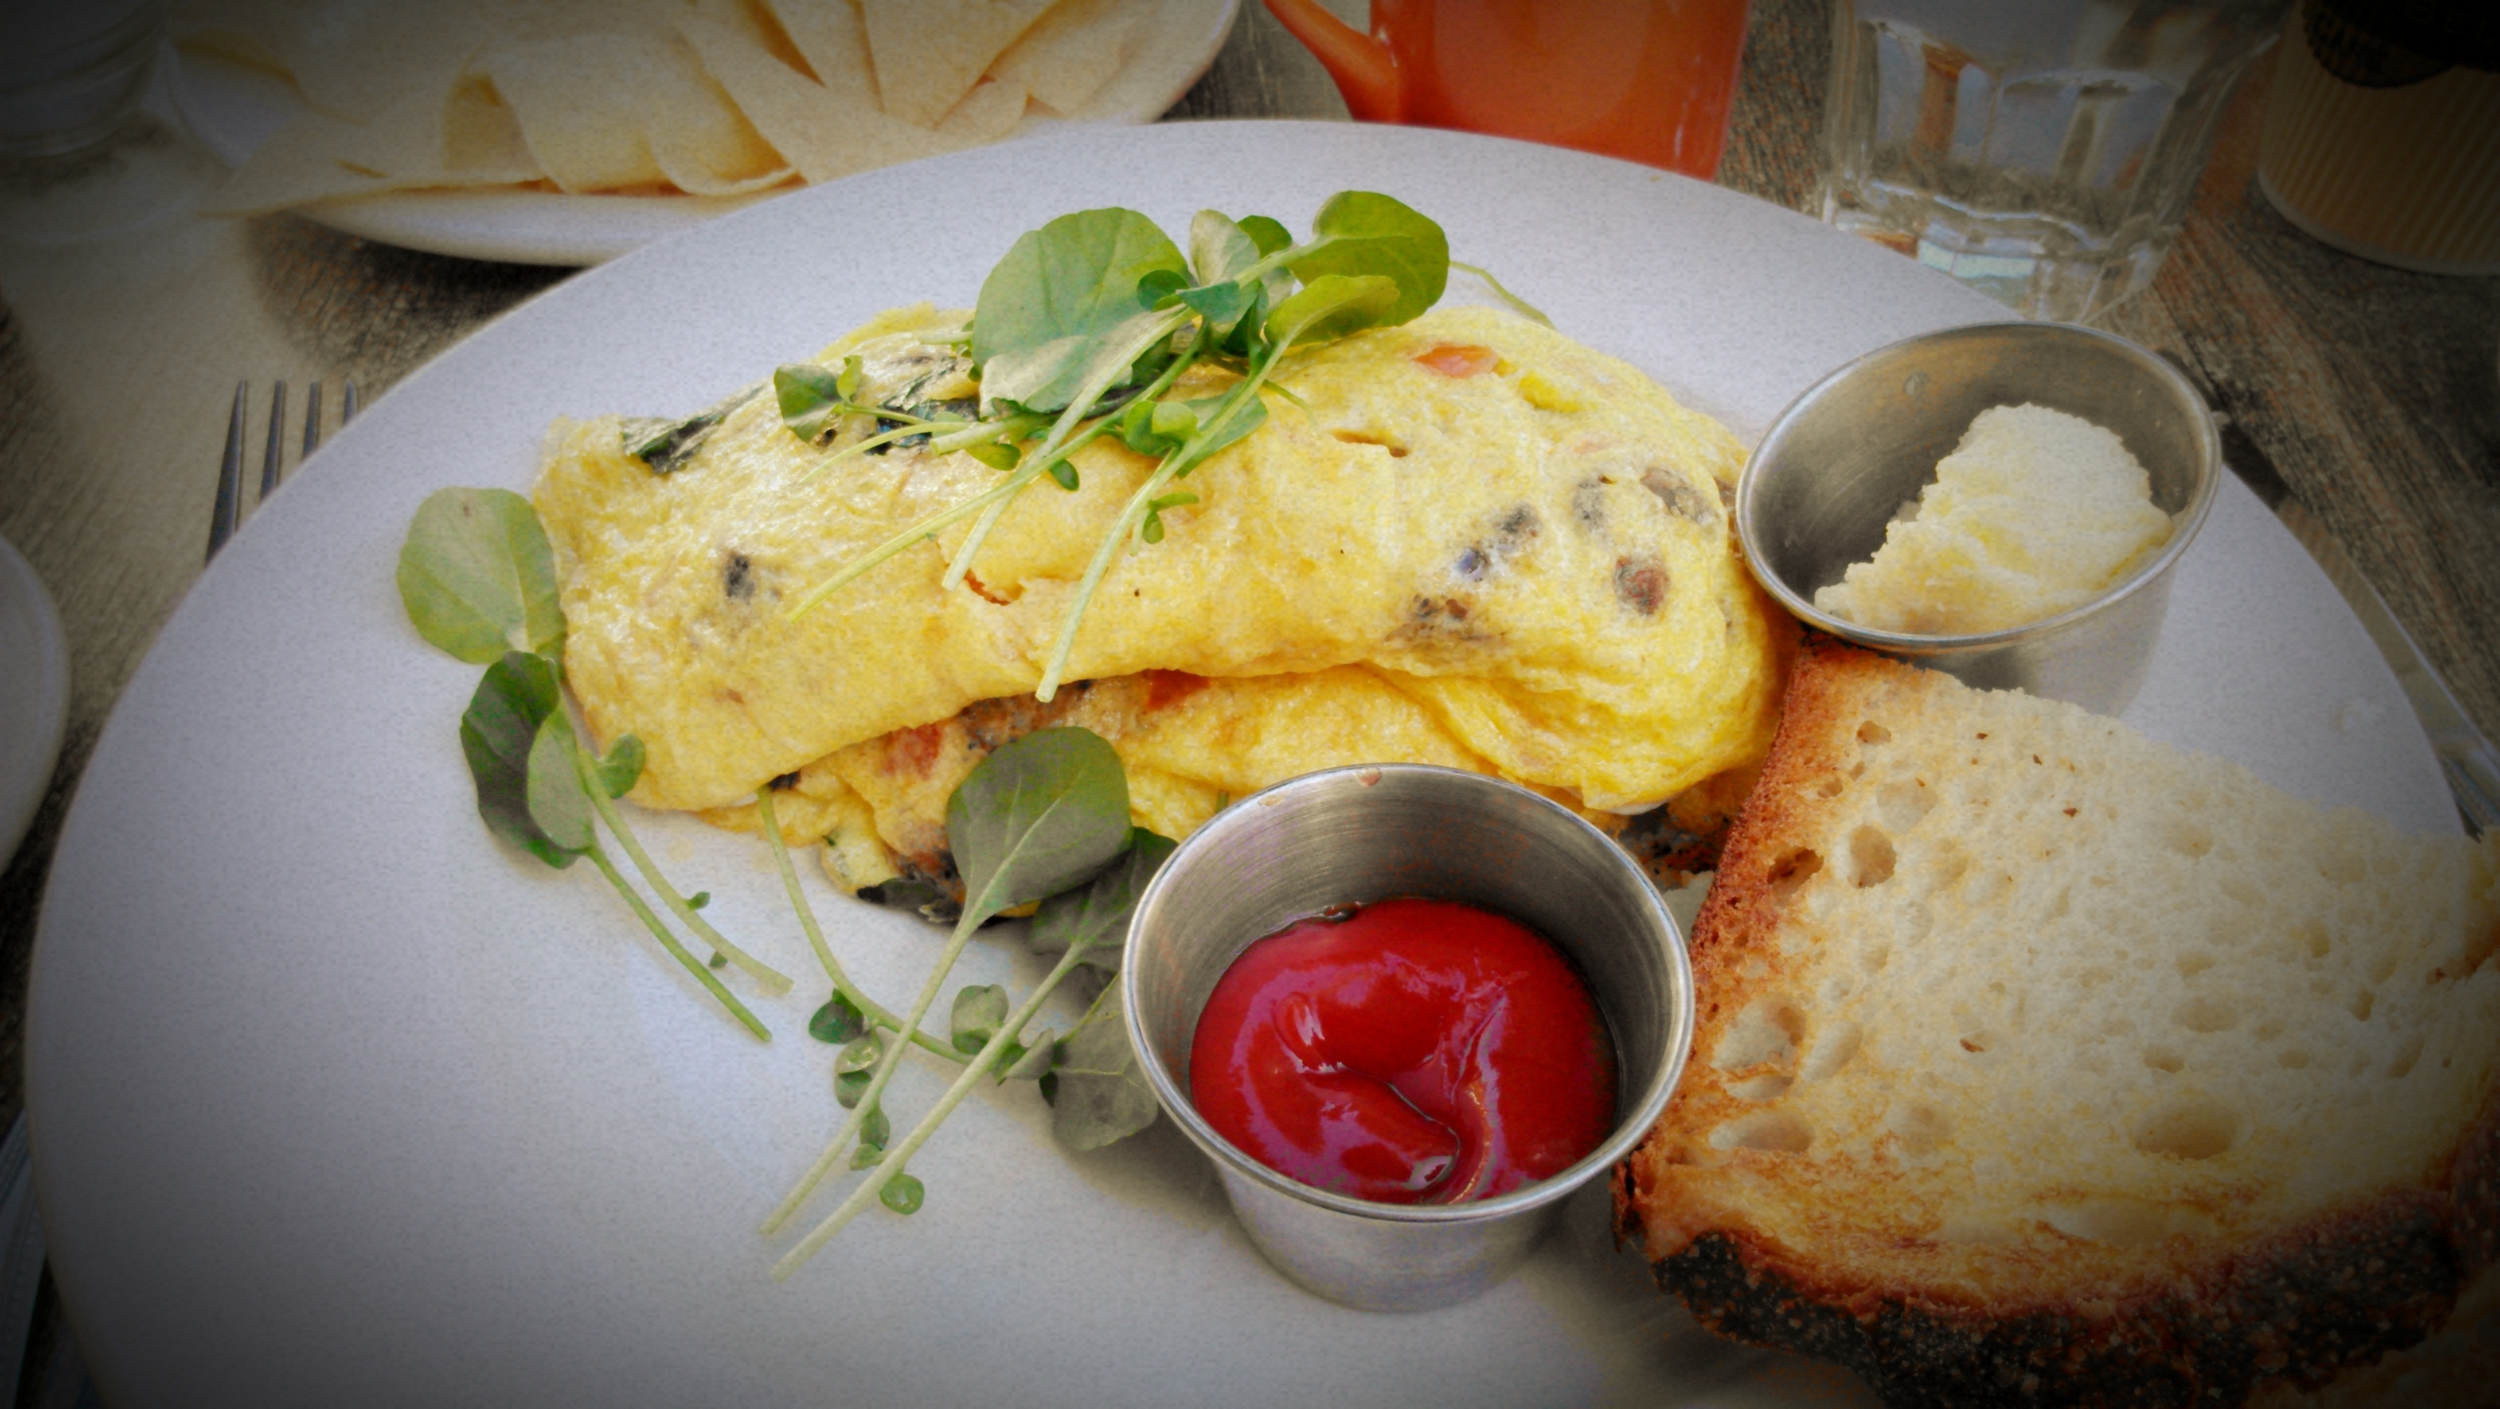 Omelette at Cody's